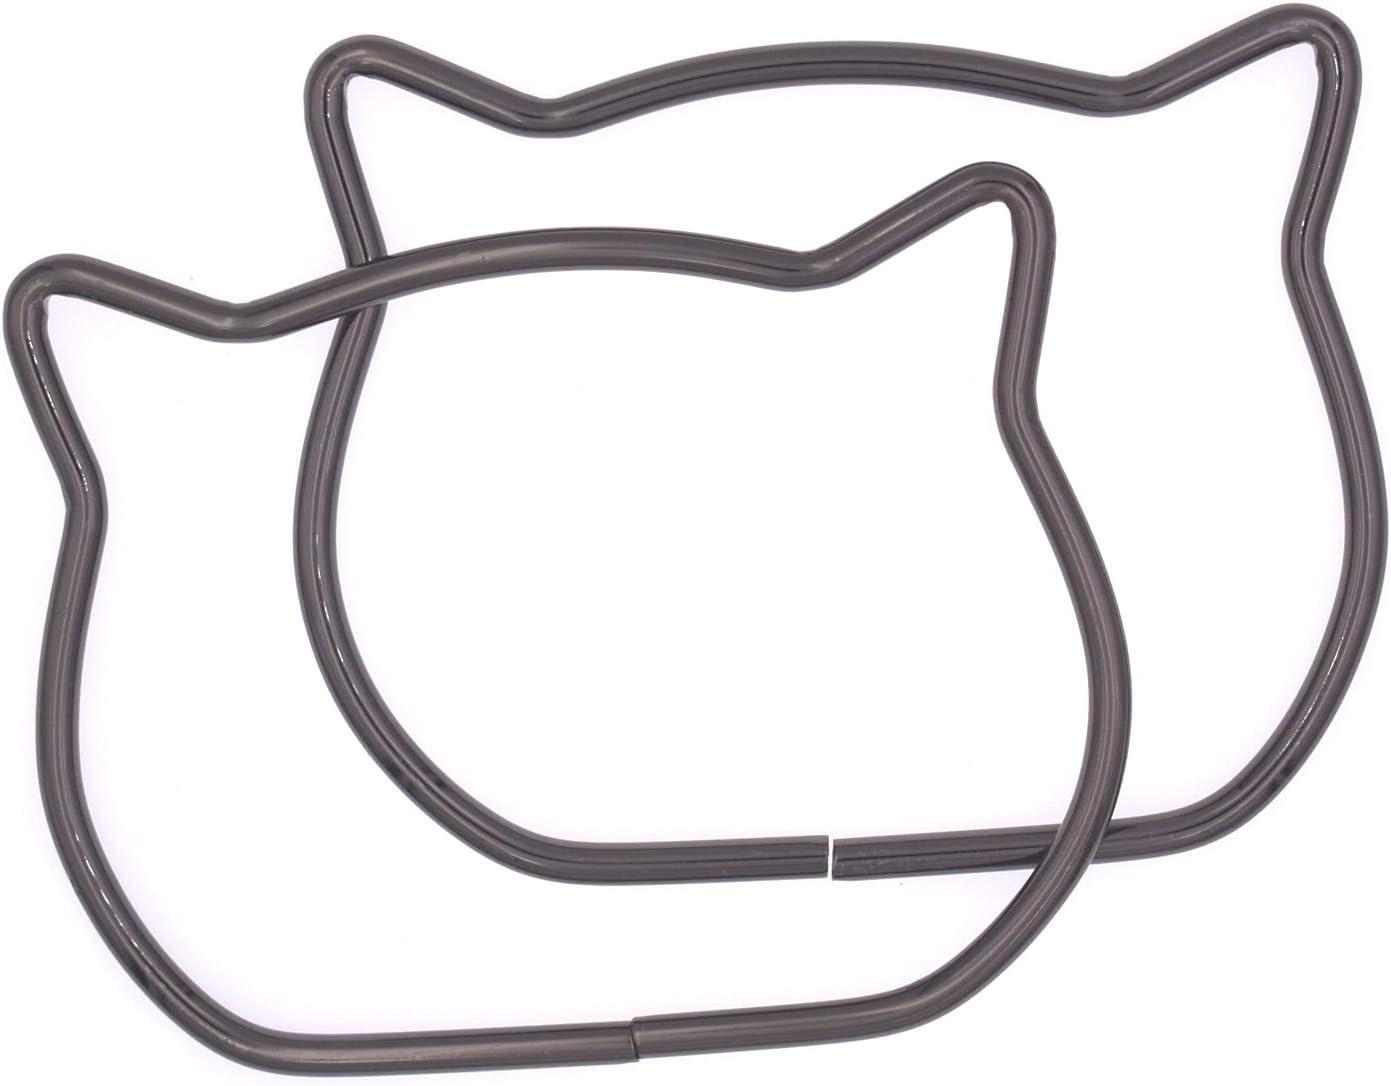 118mm//4.65 Cat Shape DIY Craft Bag Metal Handles Frame 3 Pcs Dia